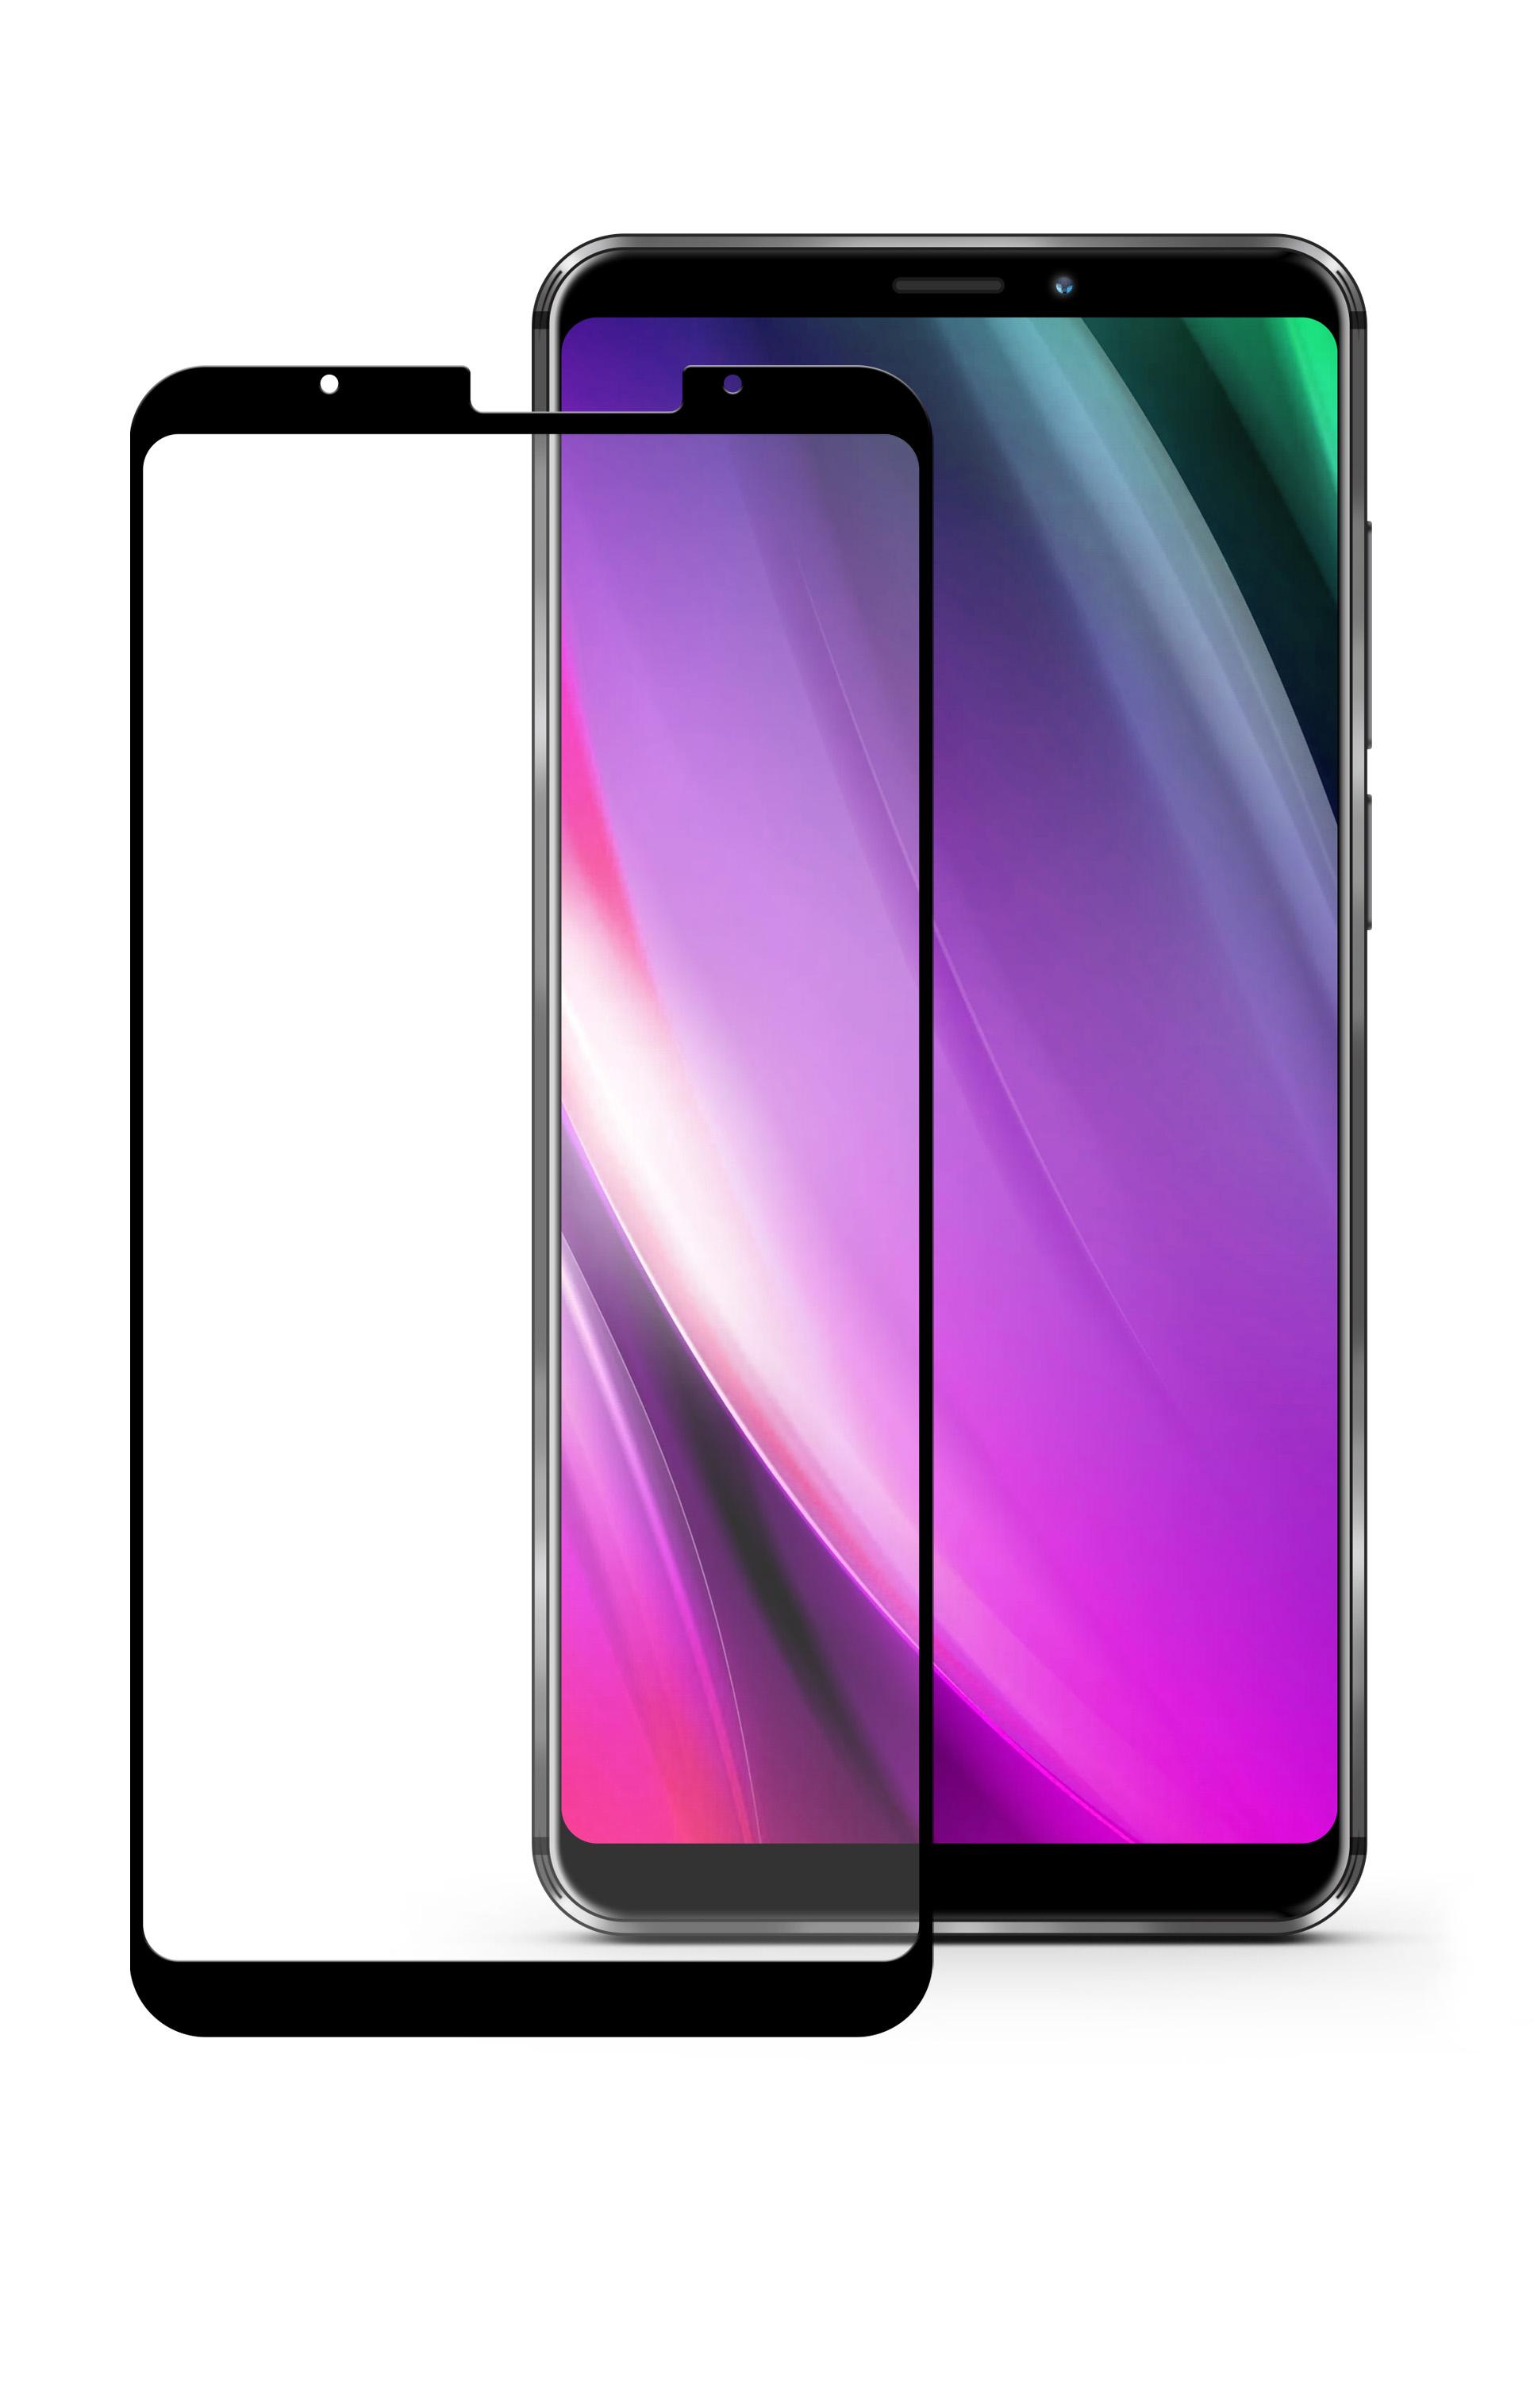 Защитное стекло Mobius для Meizu Note 8 3D Full Cover (Black) аксессуар защитное стекло mobius для honor 7c pro 3d full cover black 4232 208